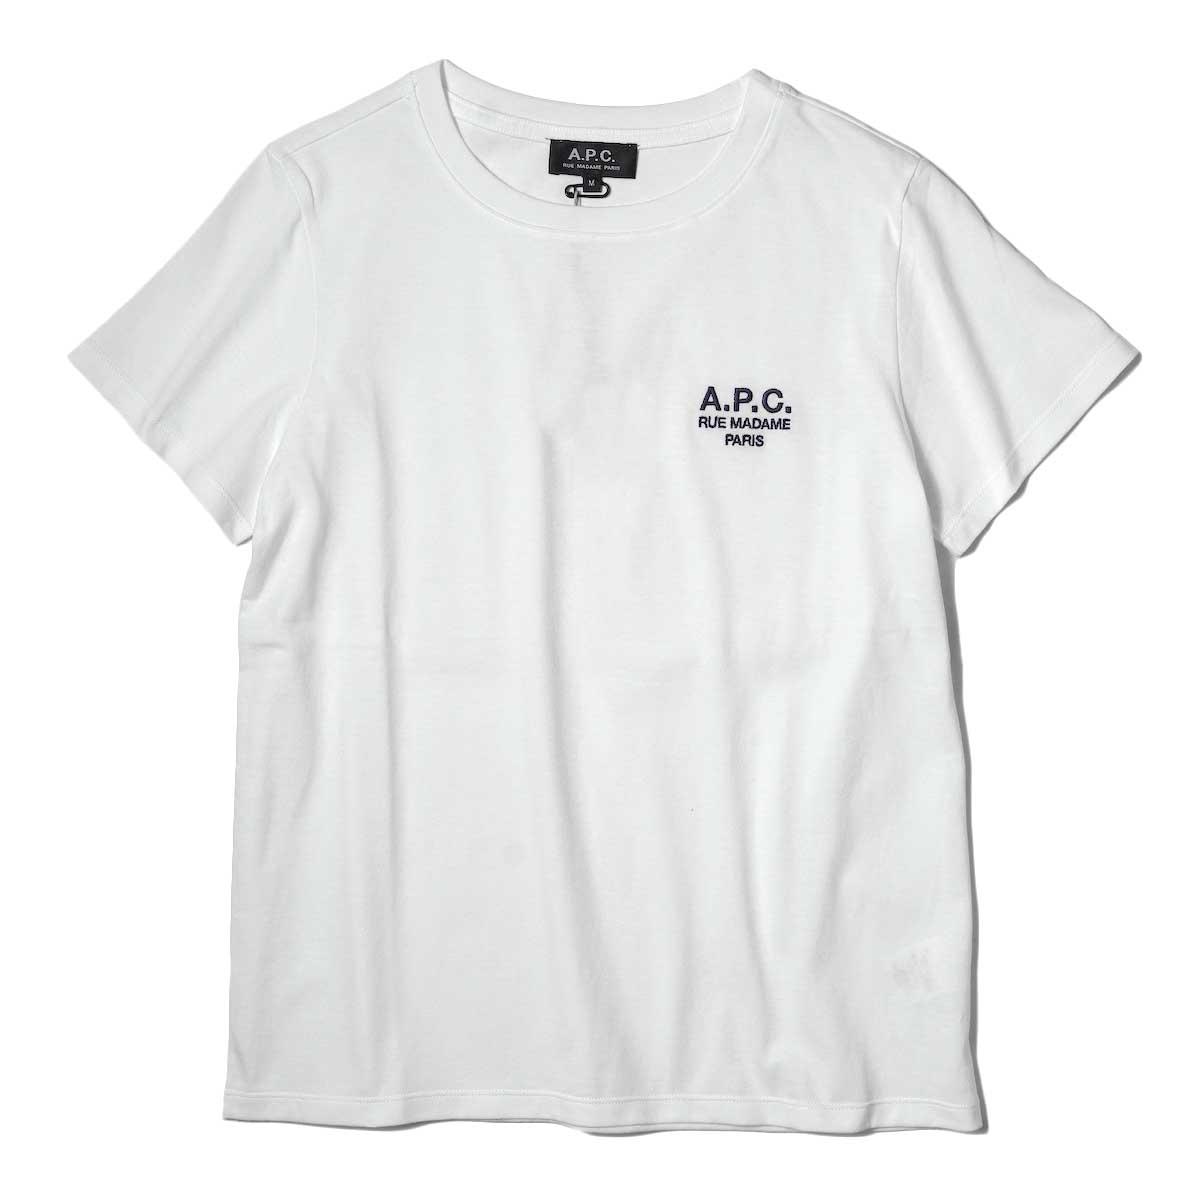 A.P.C. / Denise Tシャツ (White)